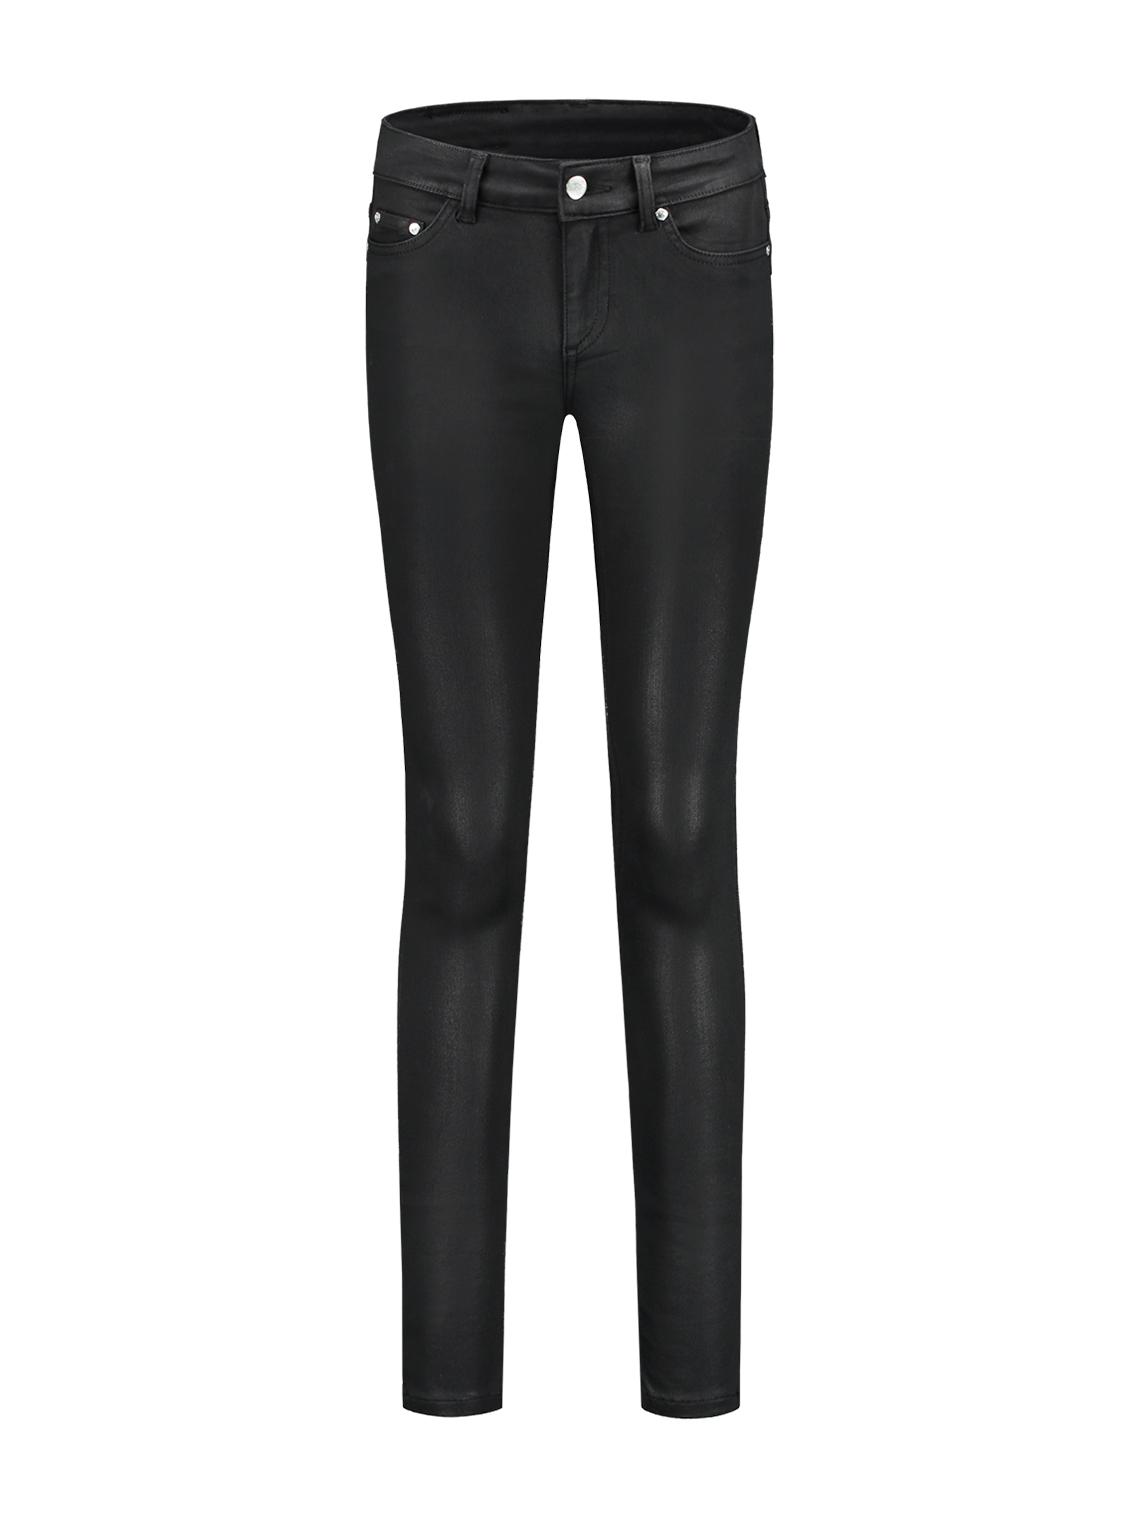 Zwarte coating dames broek Nikkie - N2-326 1705 8503